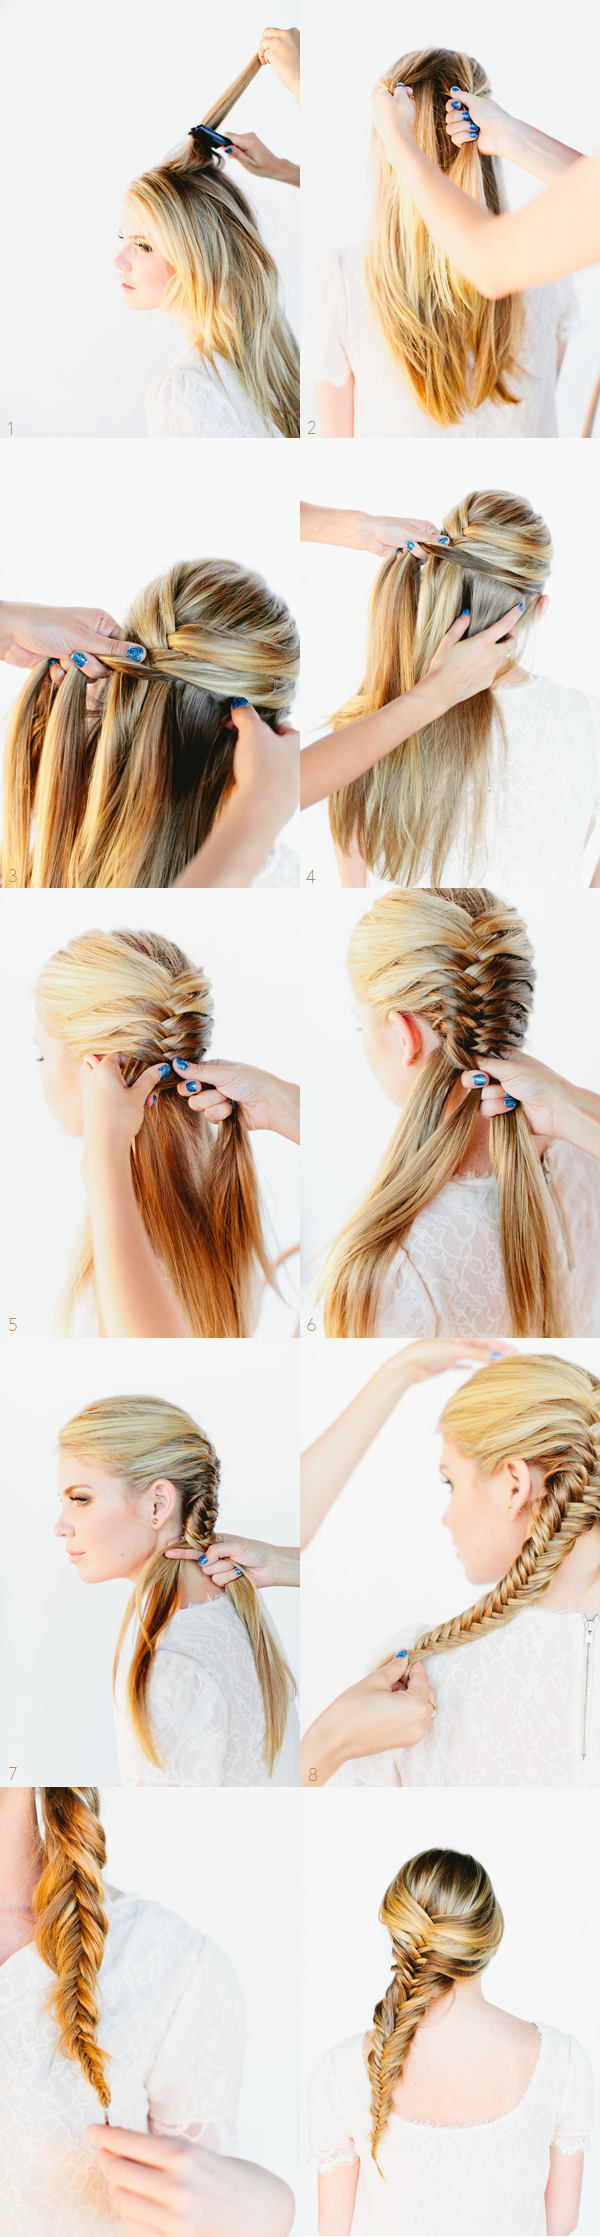 22 Ways To Make Your Hairstyle With Braids Fishtail Braid Tutorialsfrench  Fishtail Braidshow